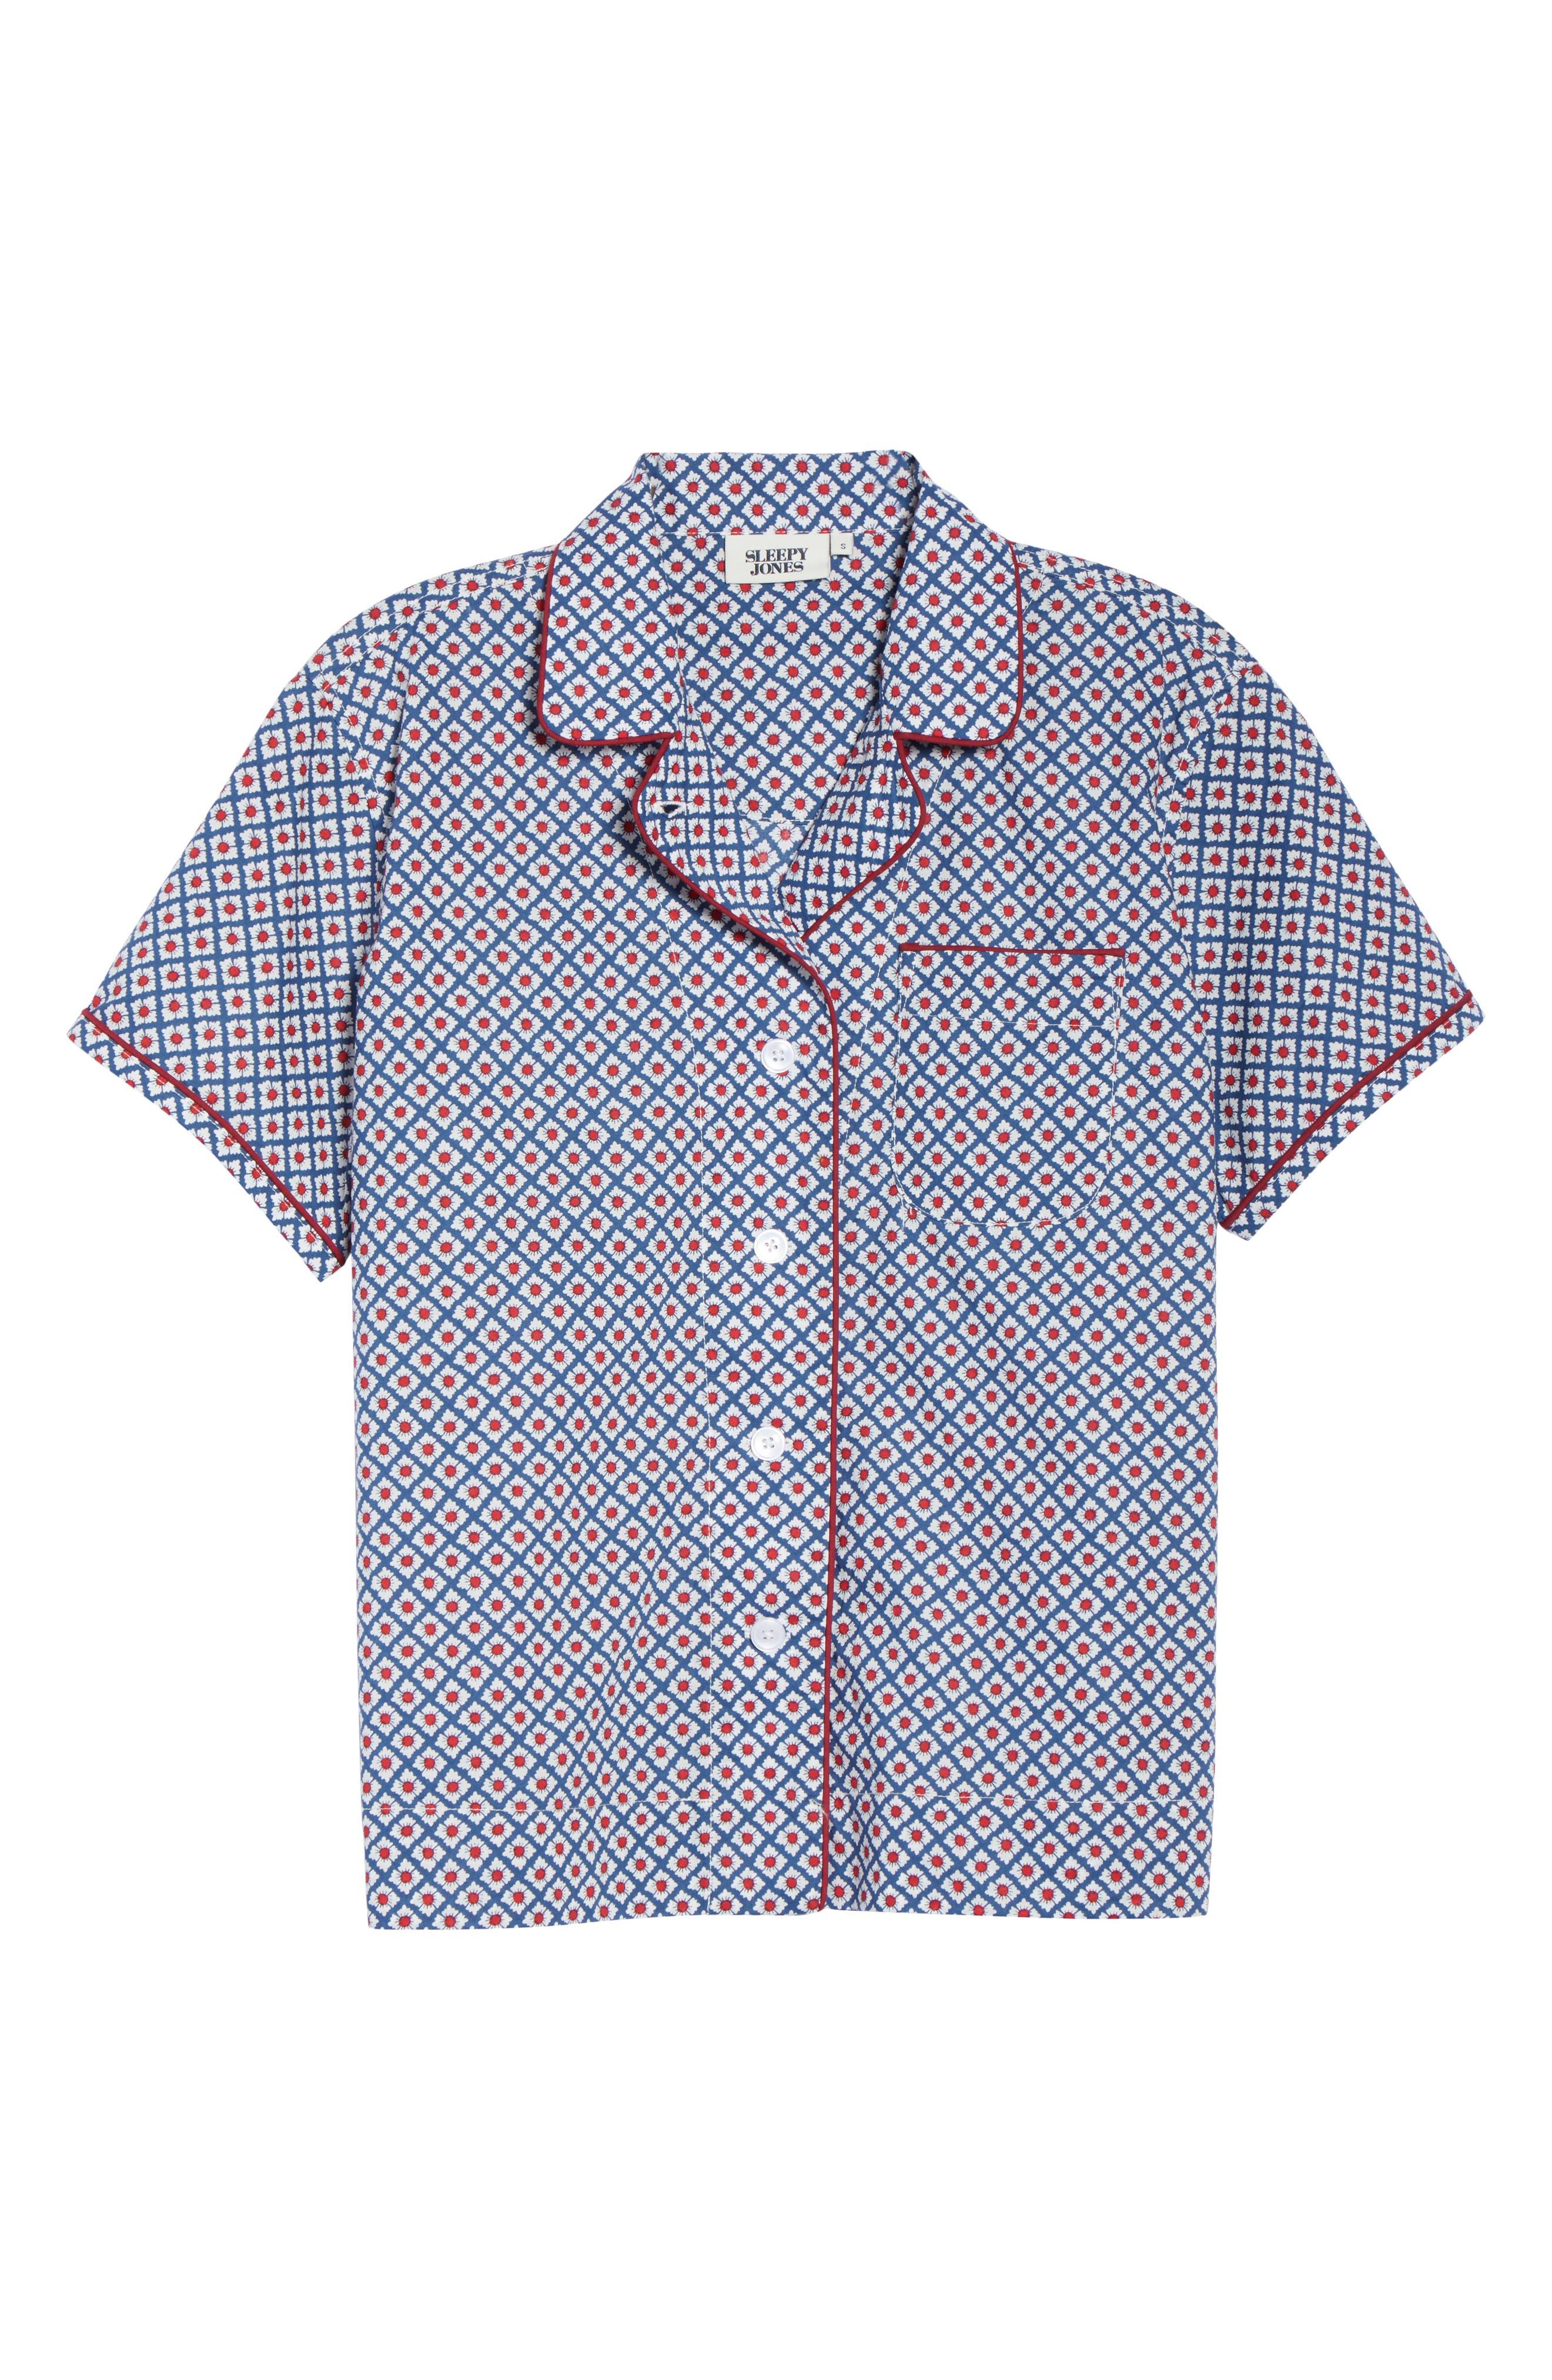 SLEEPY JONES Pajama Shirt in Navy